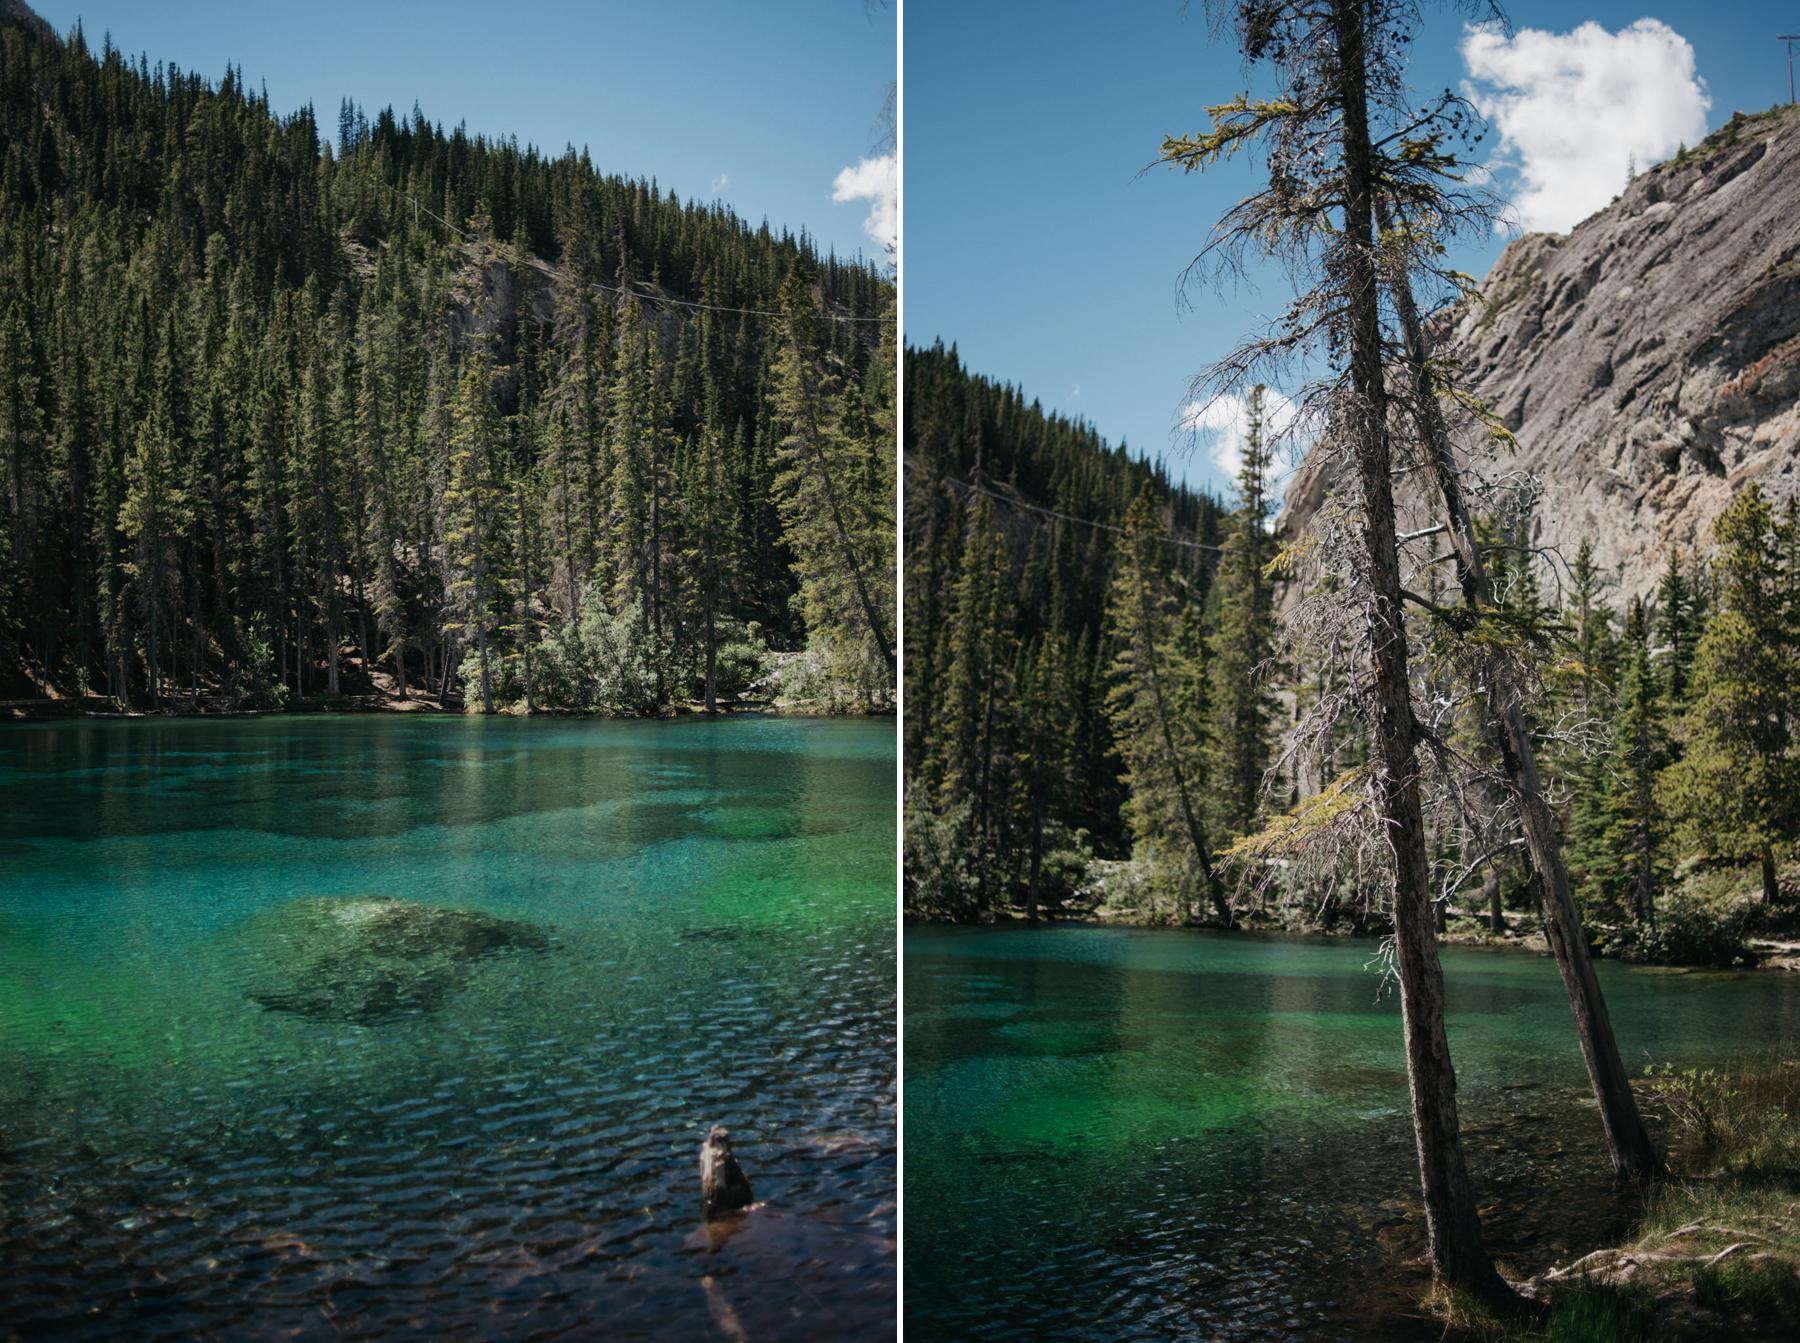 Grassi Lakes trail hike in Canmore // Daring Wanderer: www.daringwanderer.com